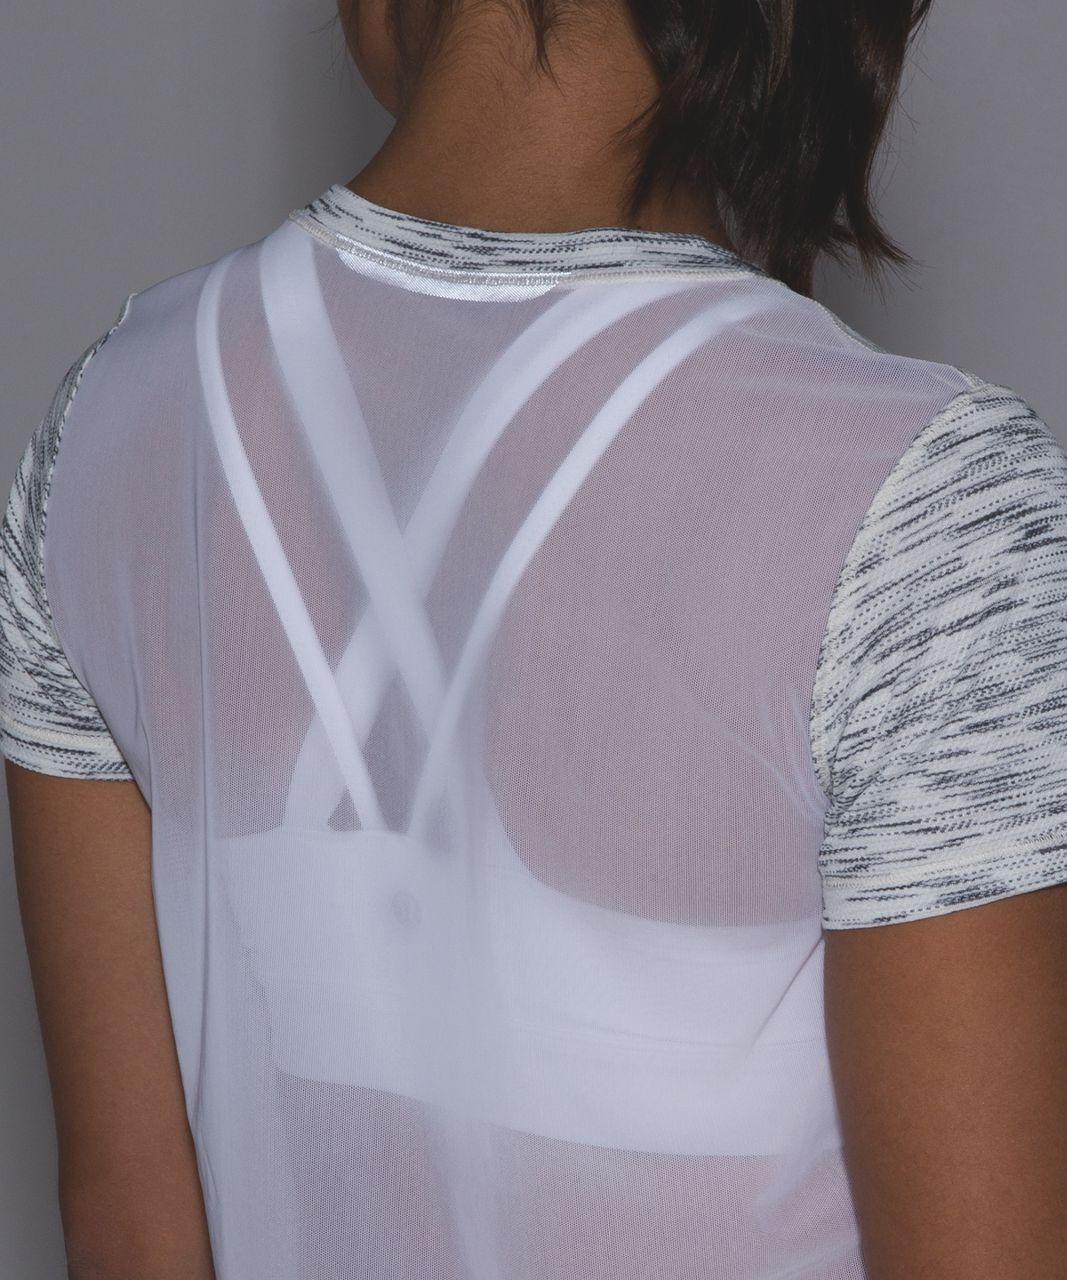 Lululemon Beat The Heat Short Sleeve (Silver) - Tiger Space Dye Black White / White